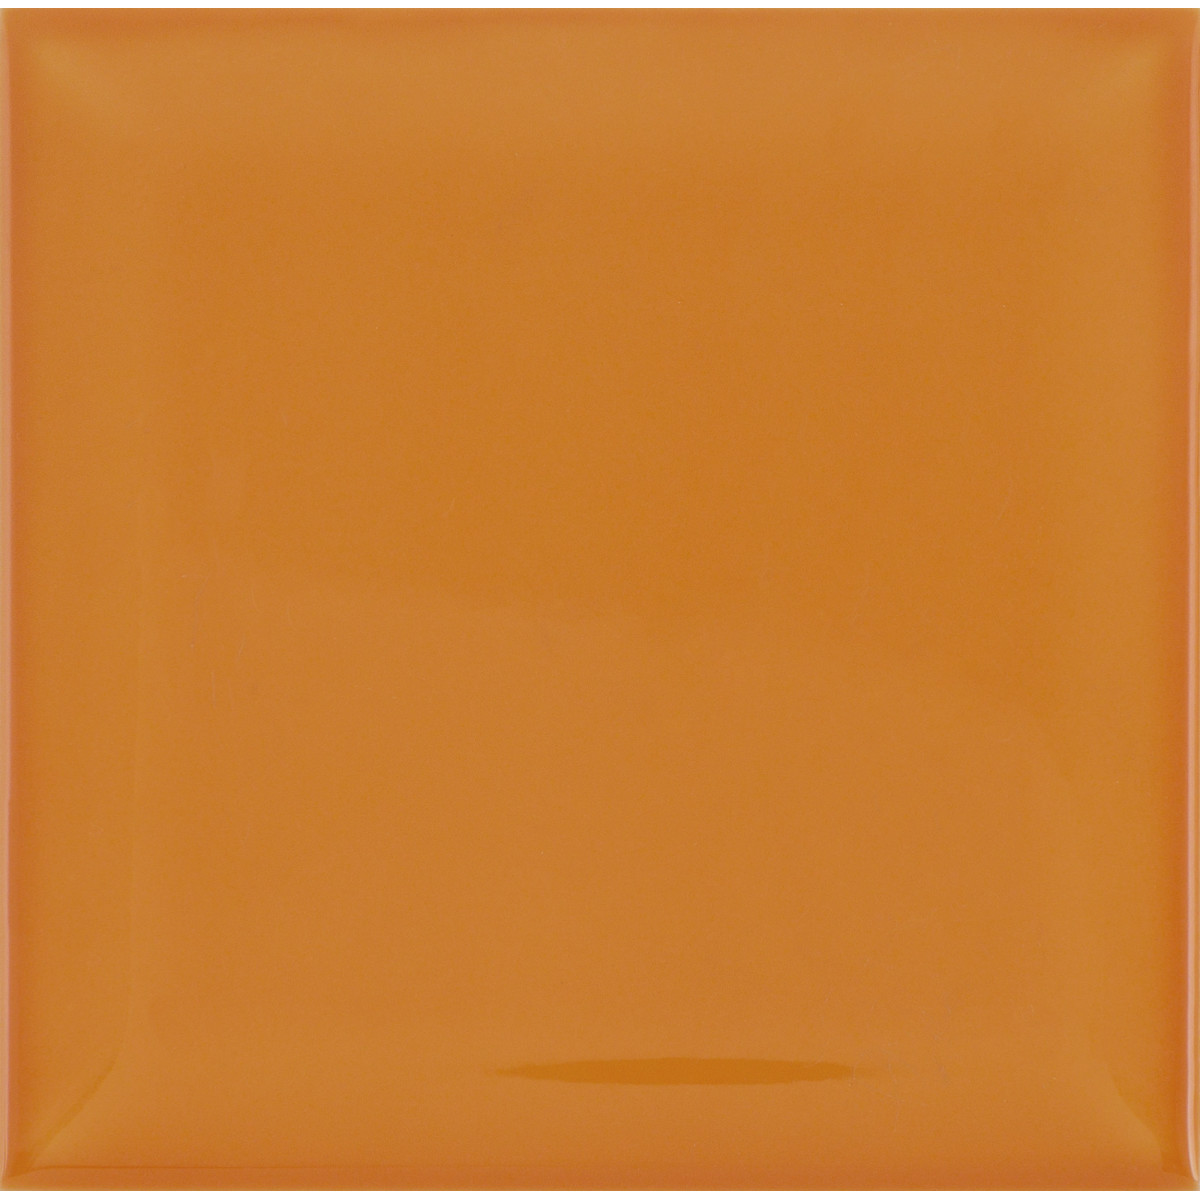 Плитка настенная Cocktail Orange 15x15 см 1 м2